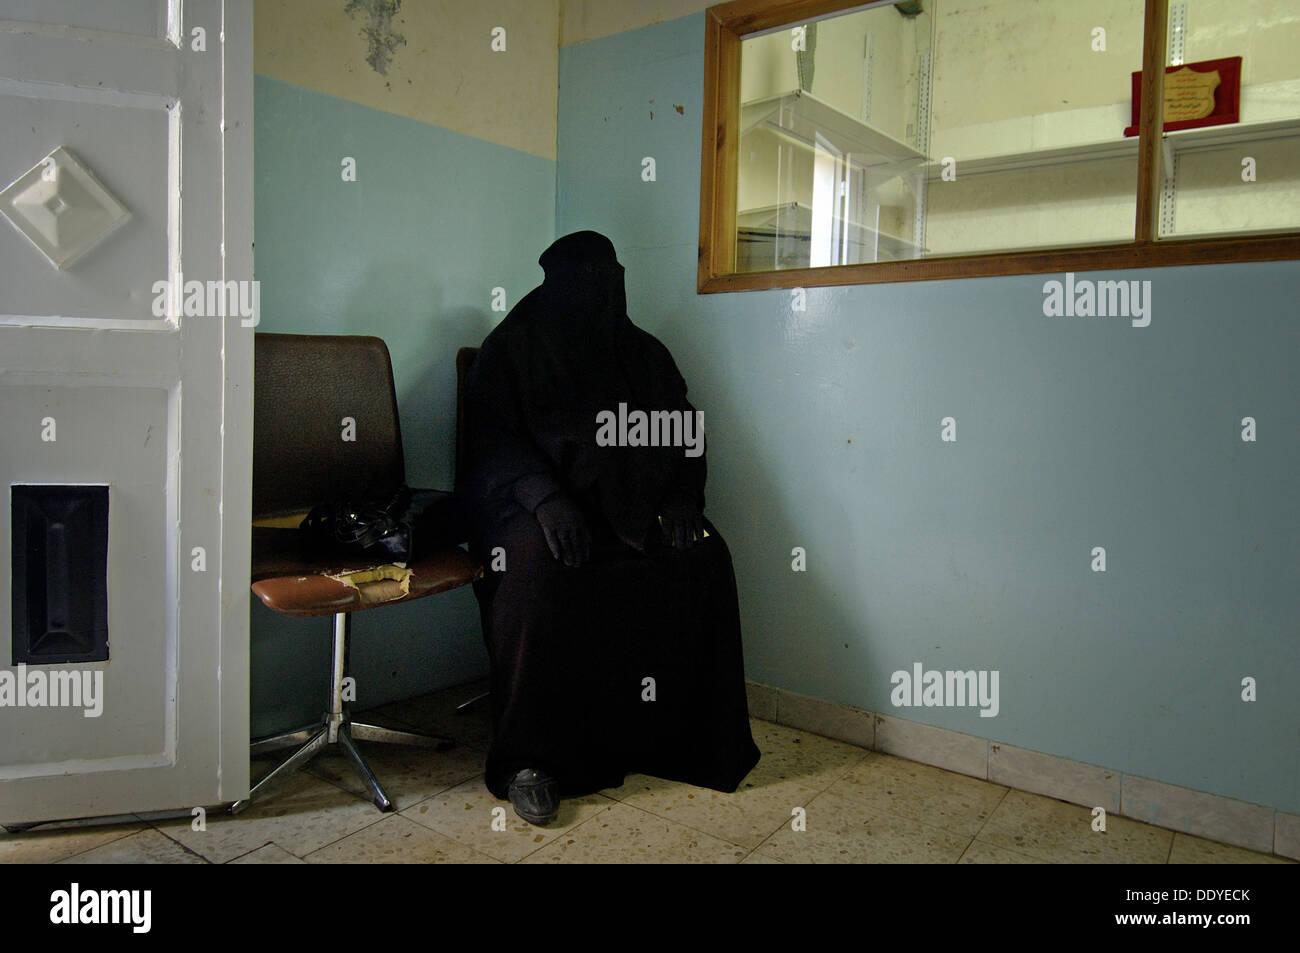 Palestinian woman wearing full black burqa garment in the west bank Israel - Stock Image